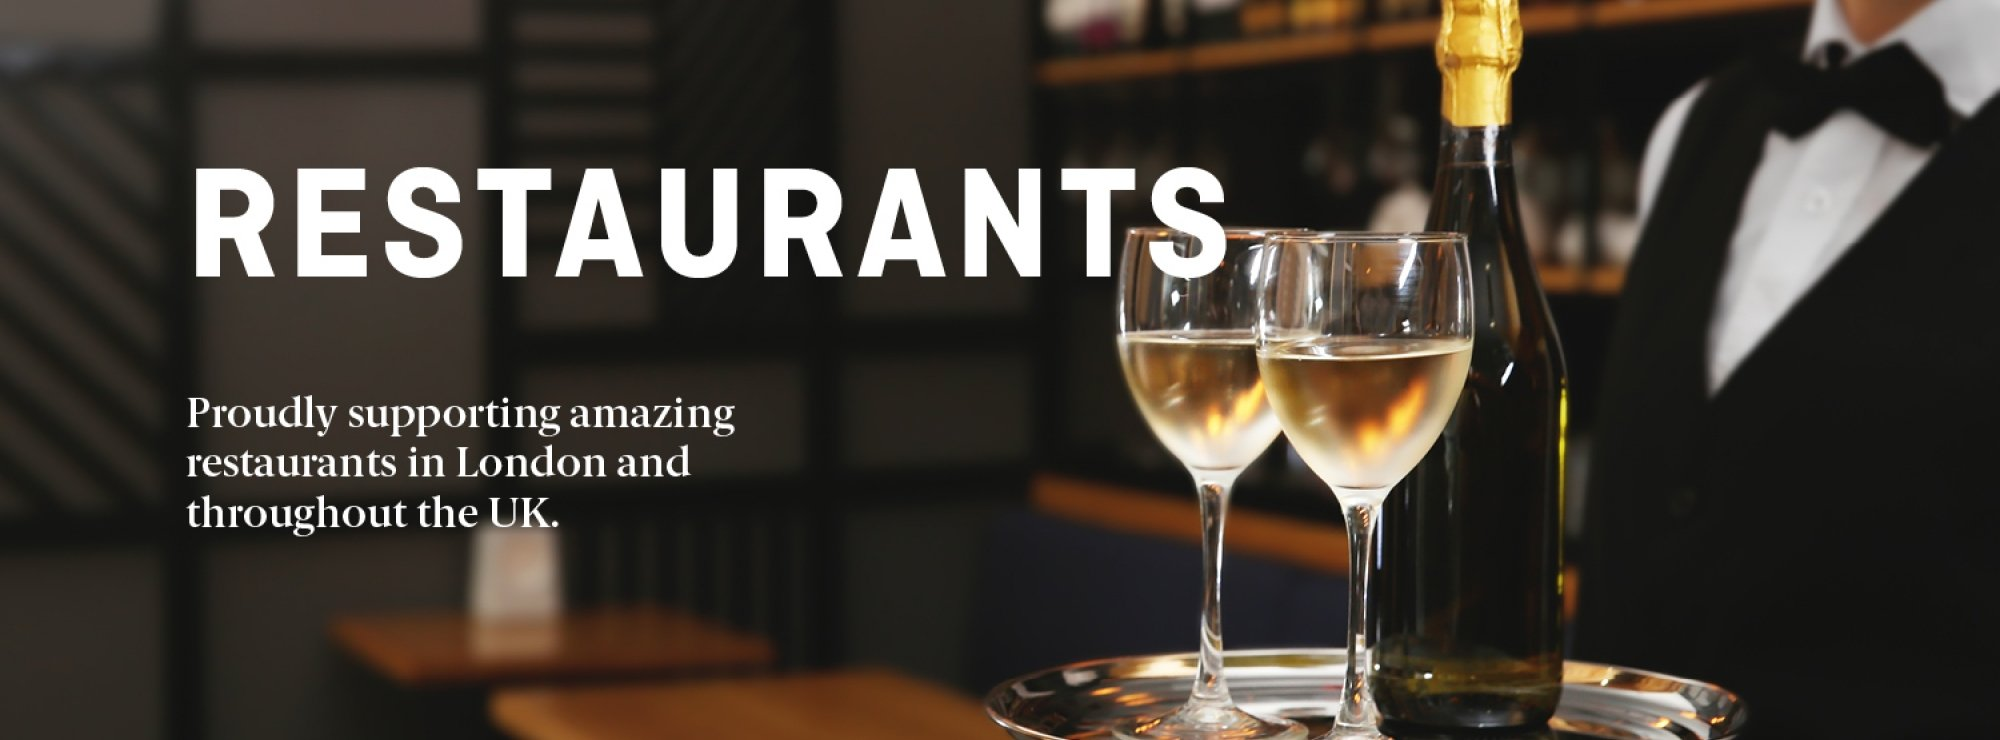 Restaurants Banner